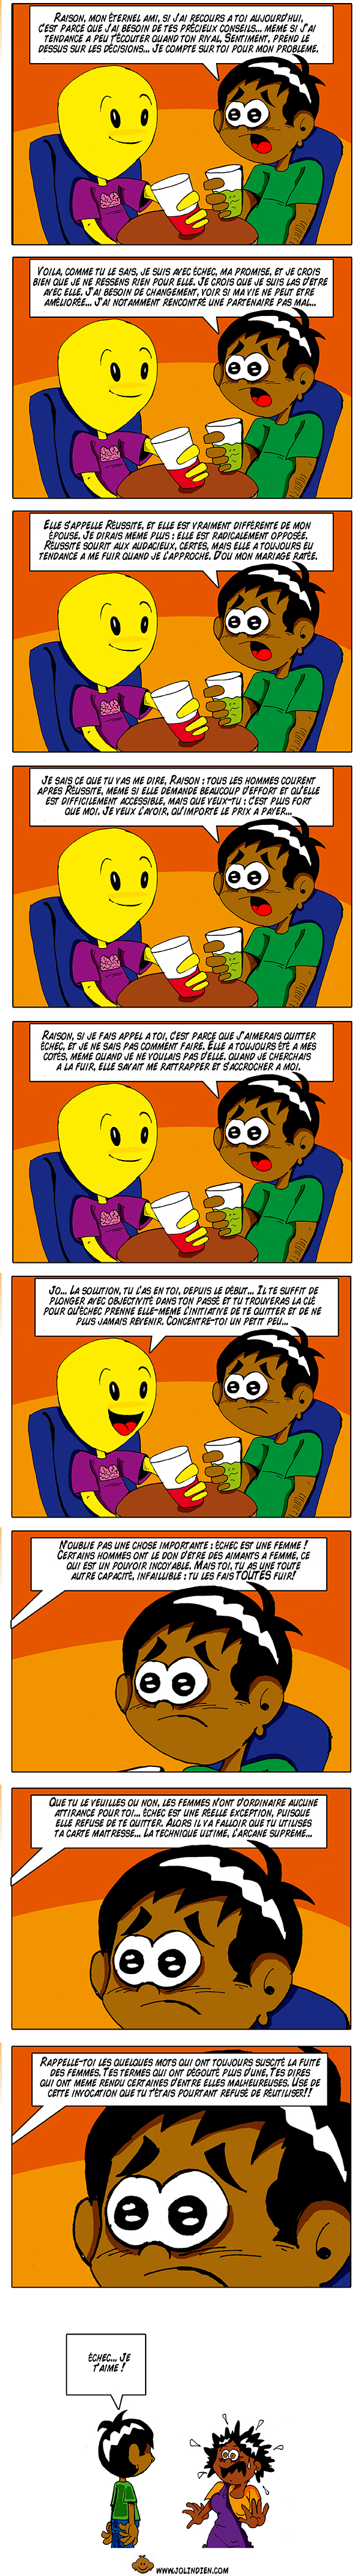 http://kamathaz.free.fr/jolindien/JoetRuptured%e9chec.jpg